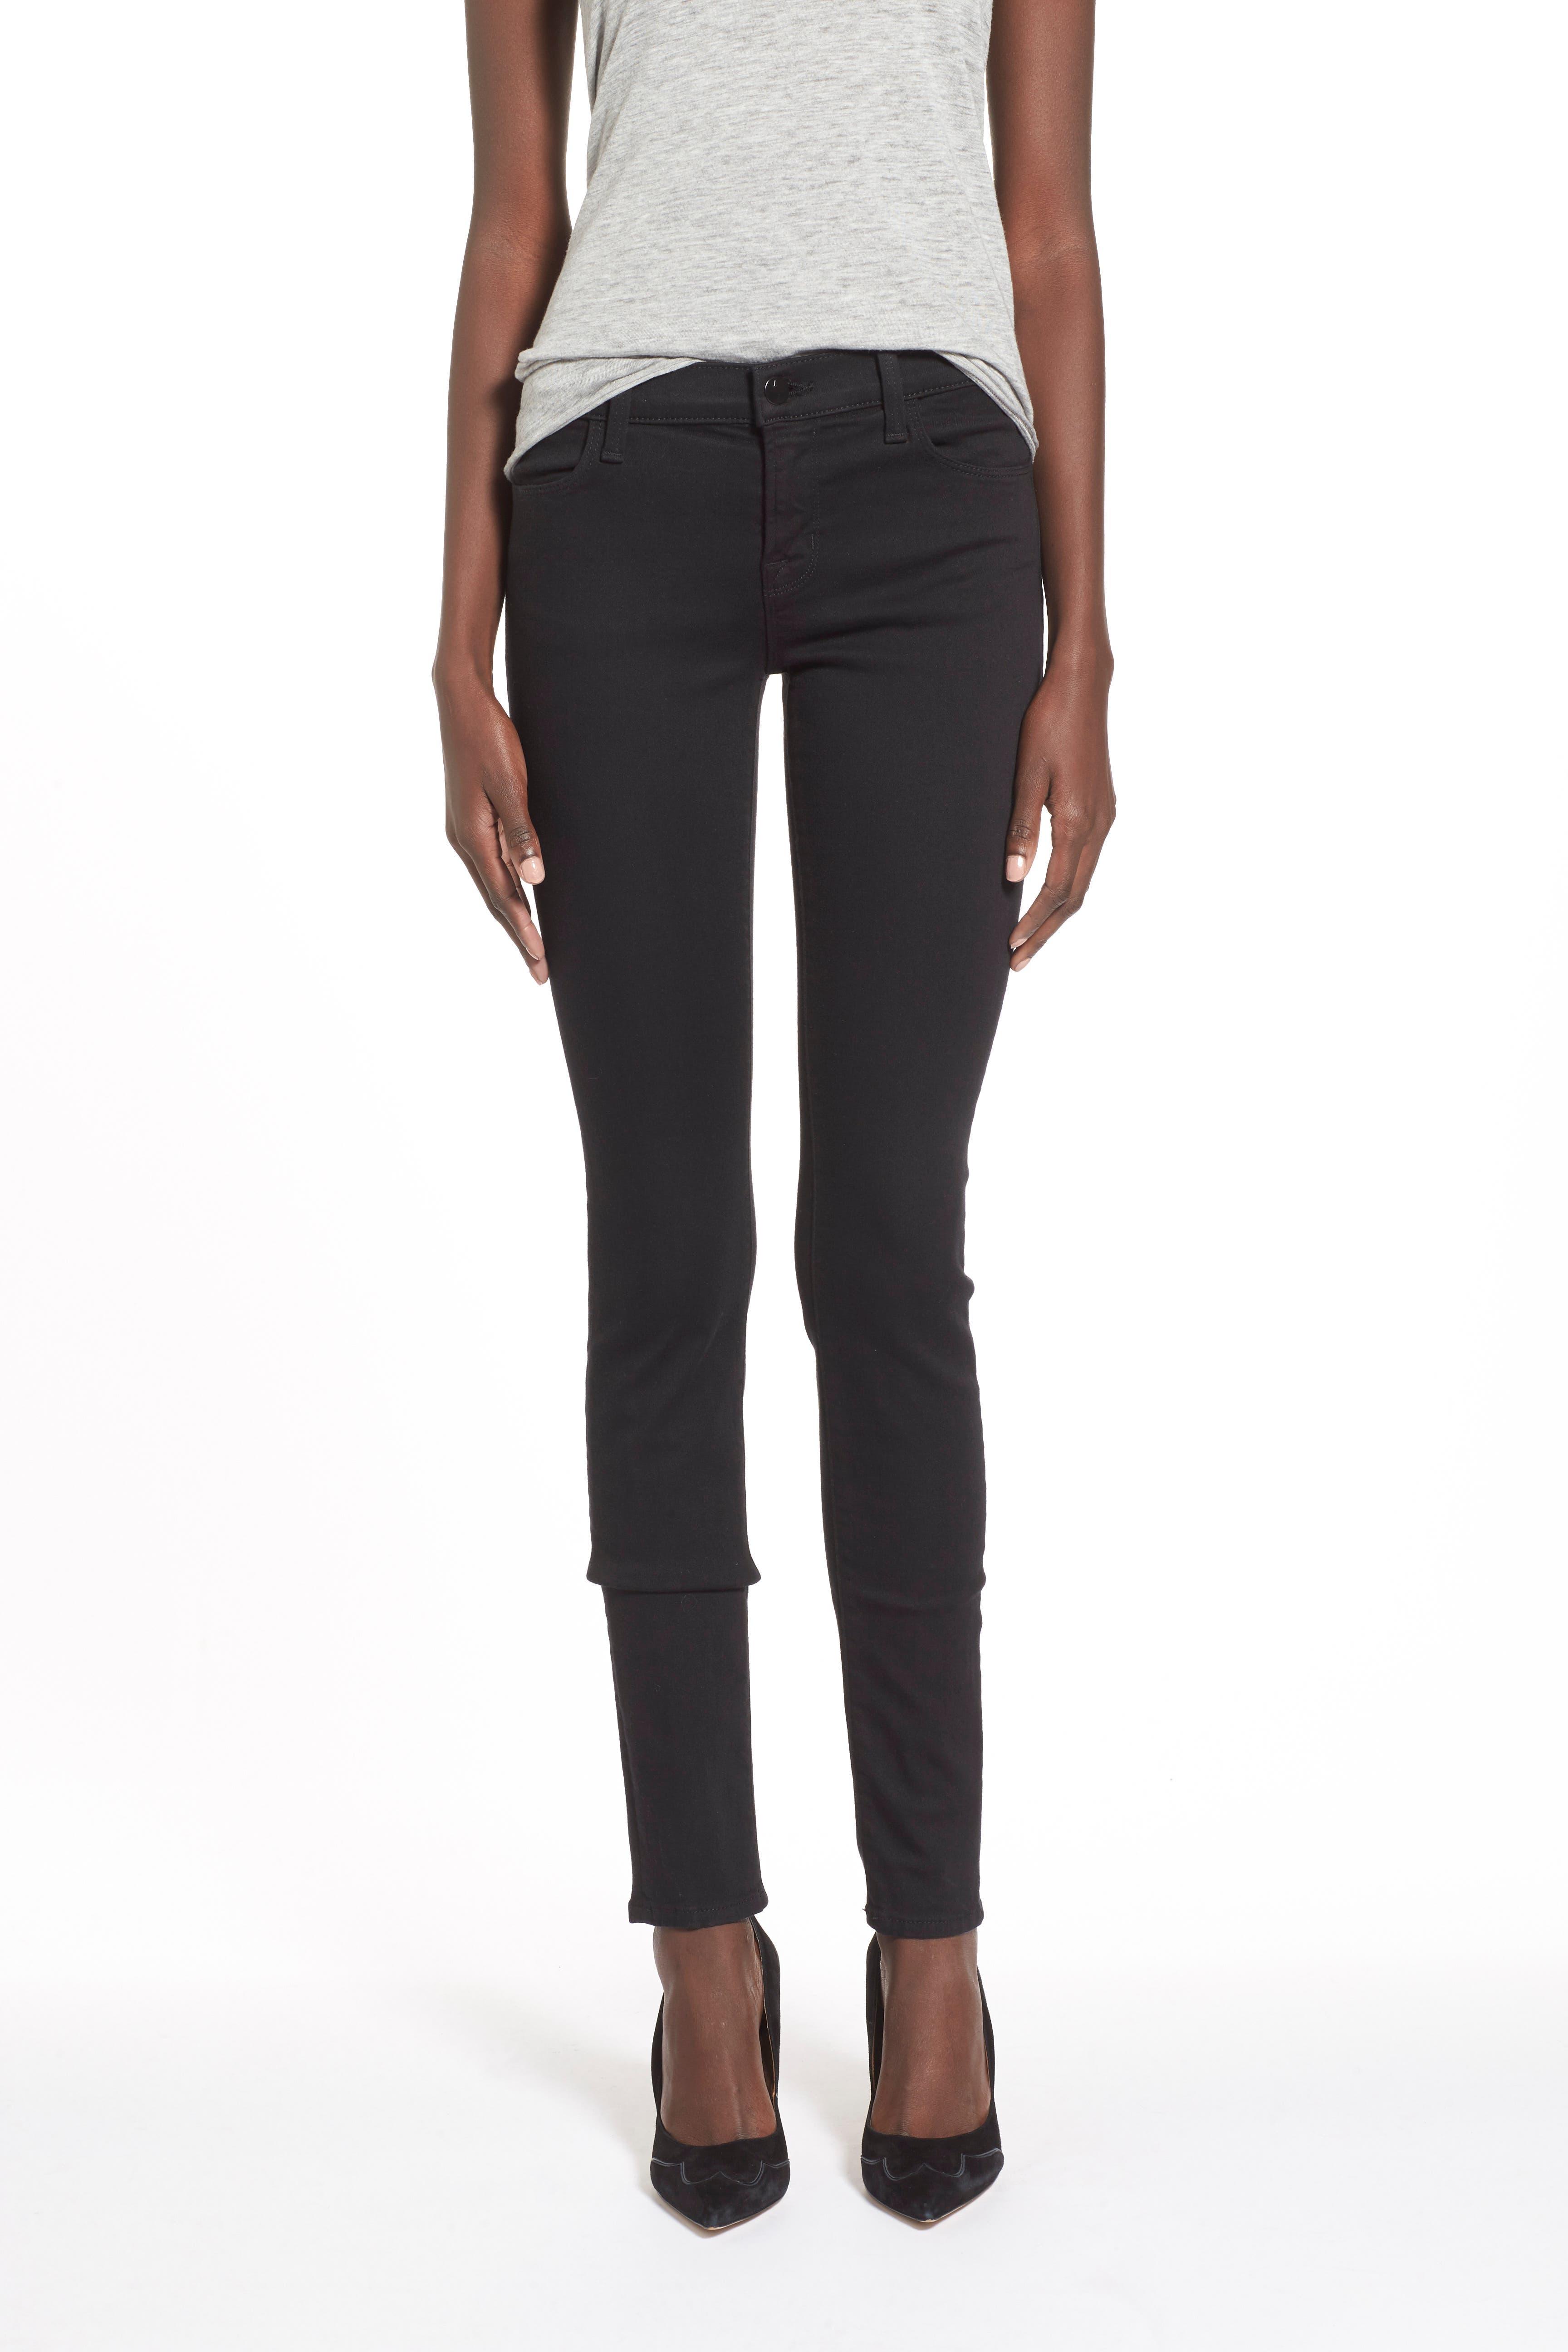 J BRAND,                             Super Skinny Jeans,                             Alternate thumbnail 7, color,                             SERIOUSLY BLACK